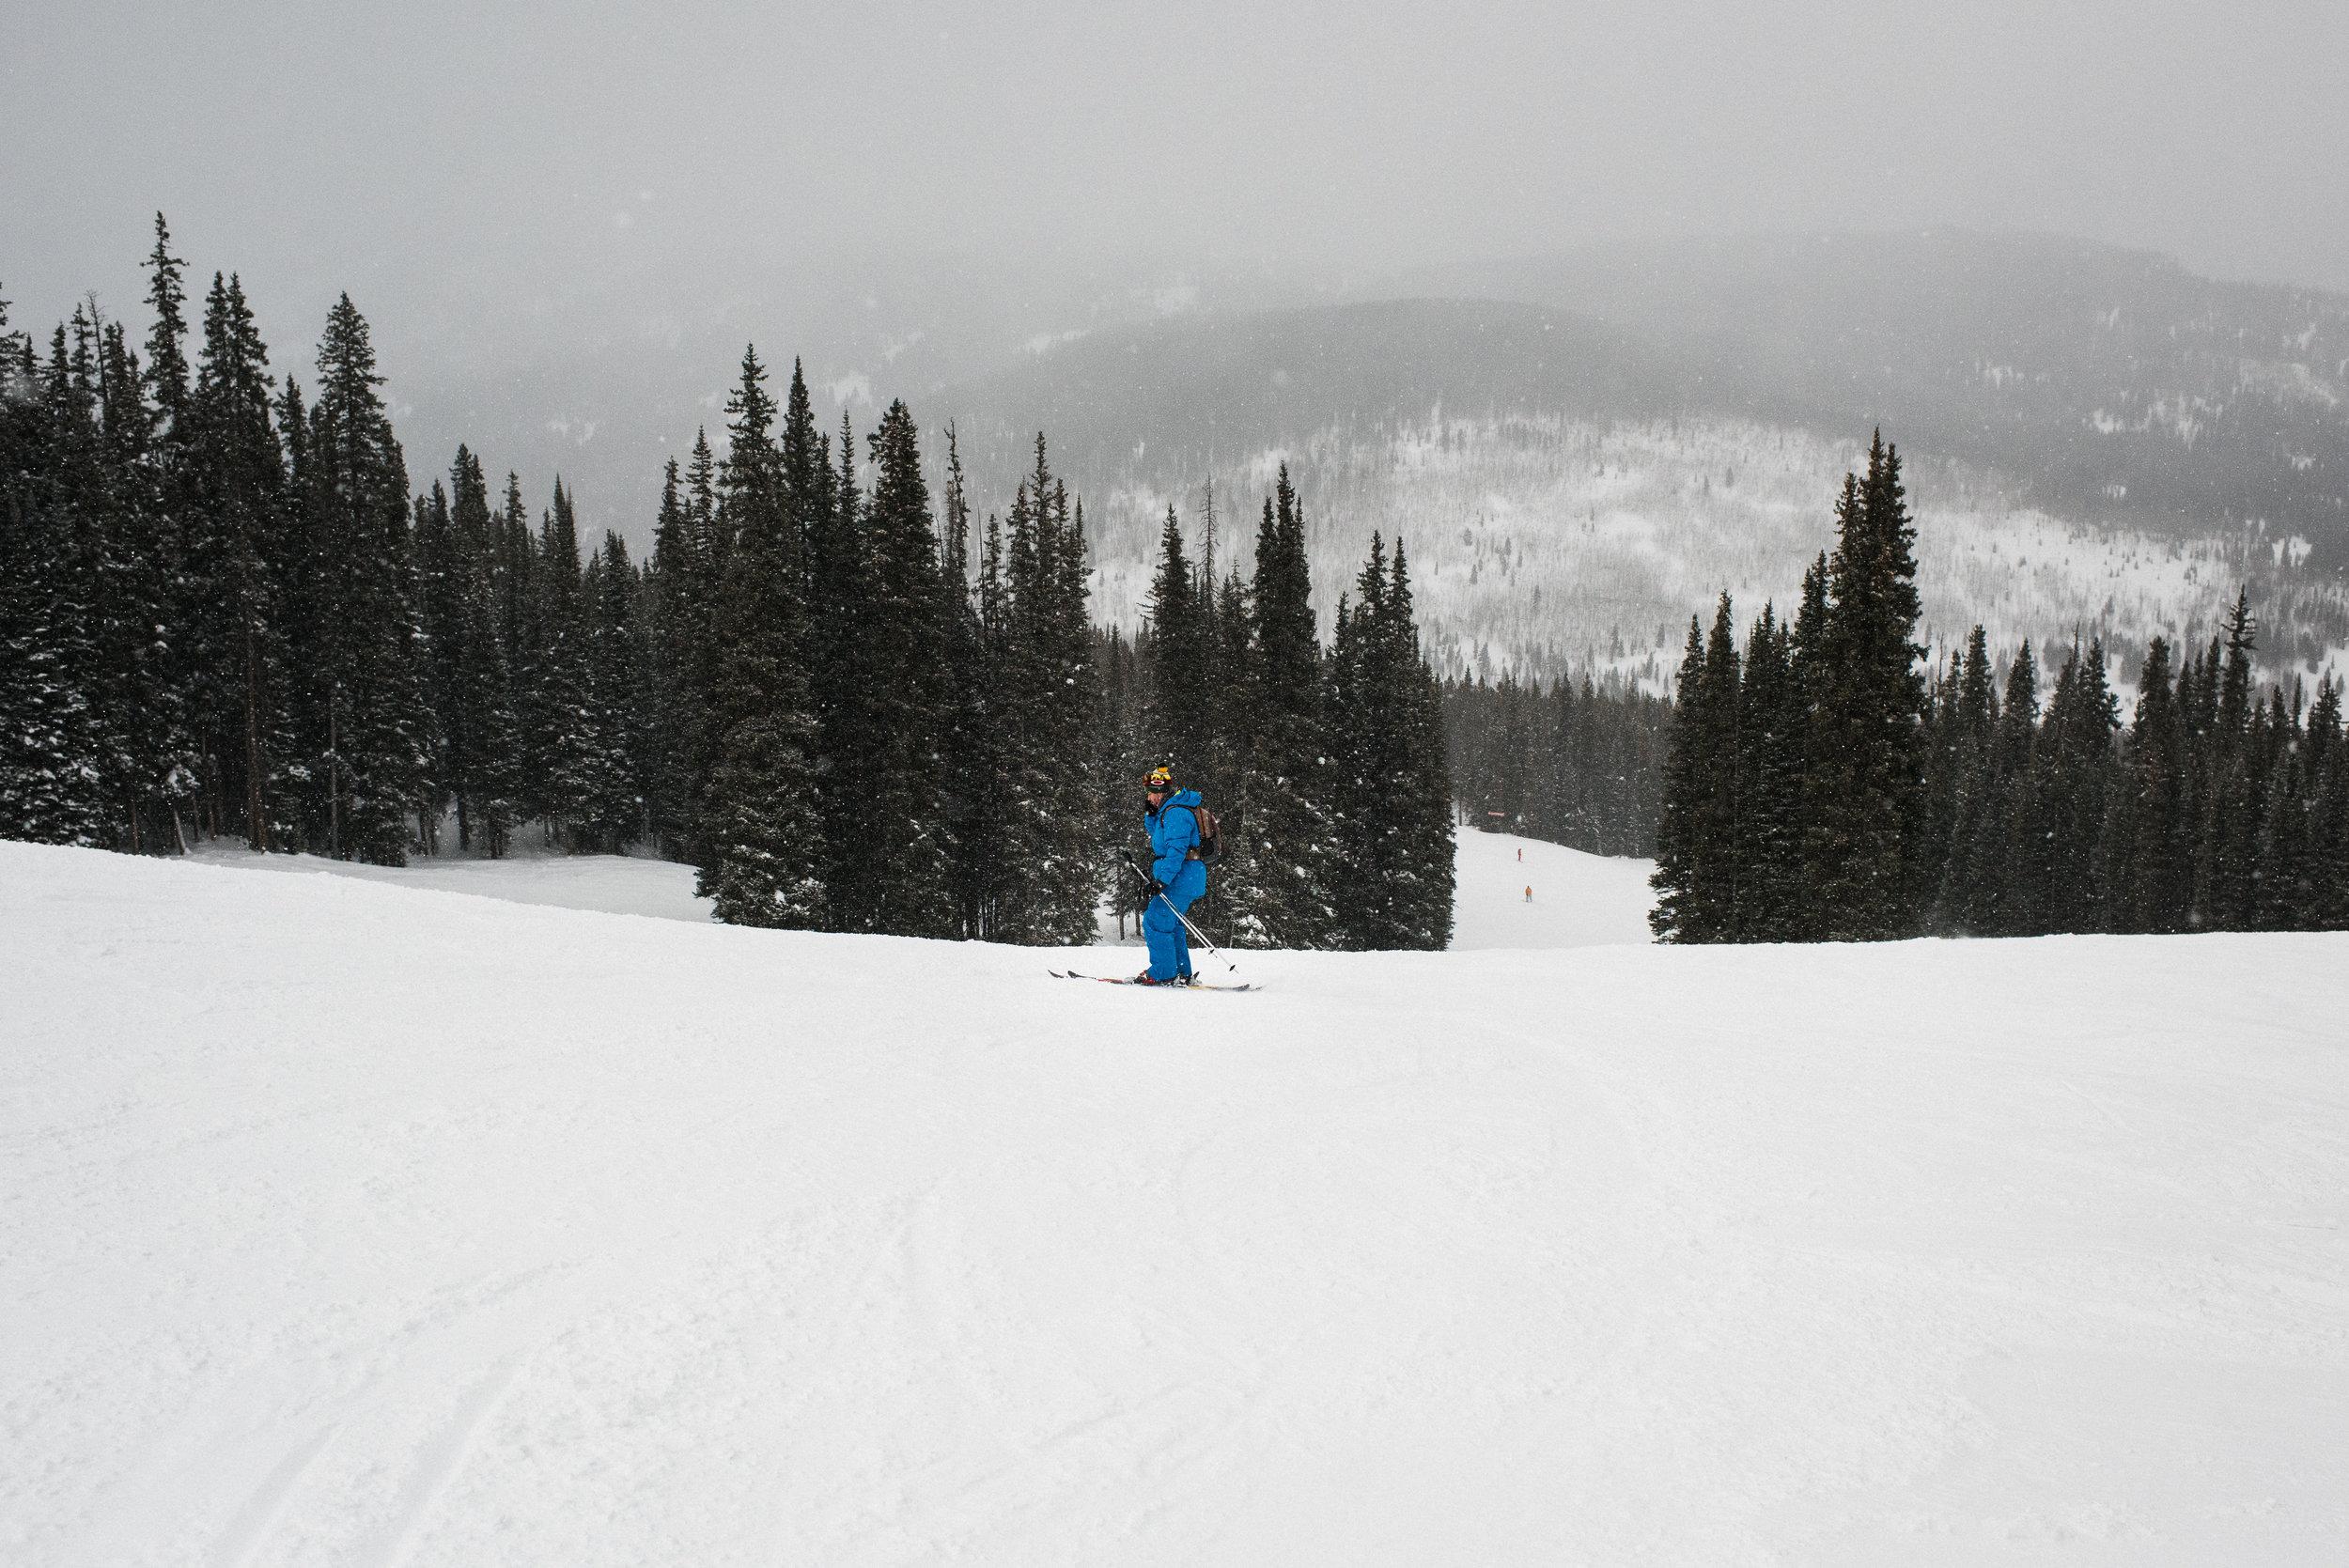 TaraShupe_Outdoor_Photographer_Loweprobags_Colorado_Copper_Mountains_Ski_08.jpg